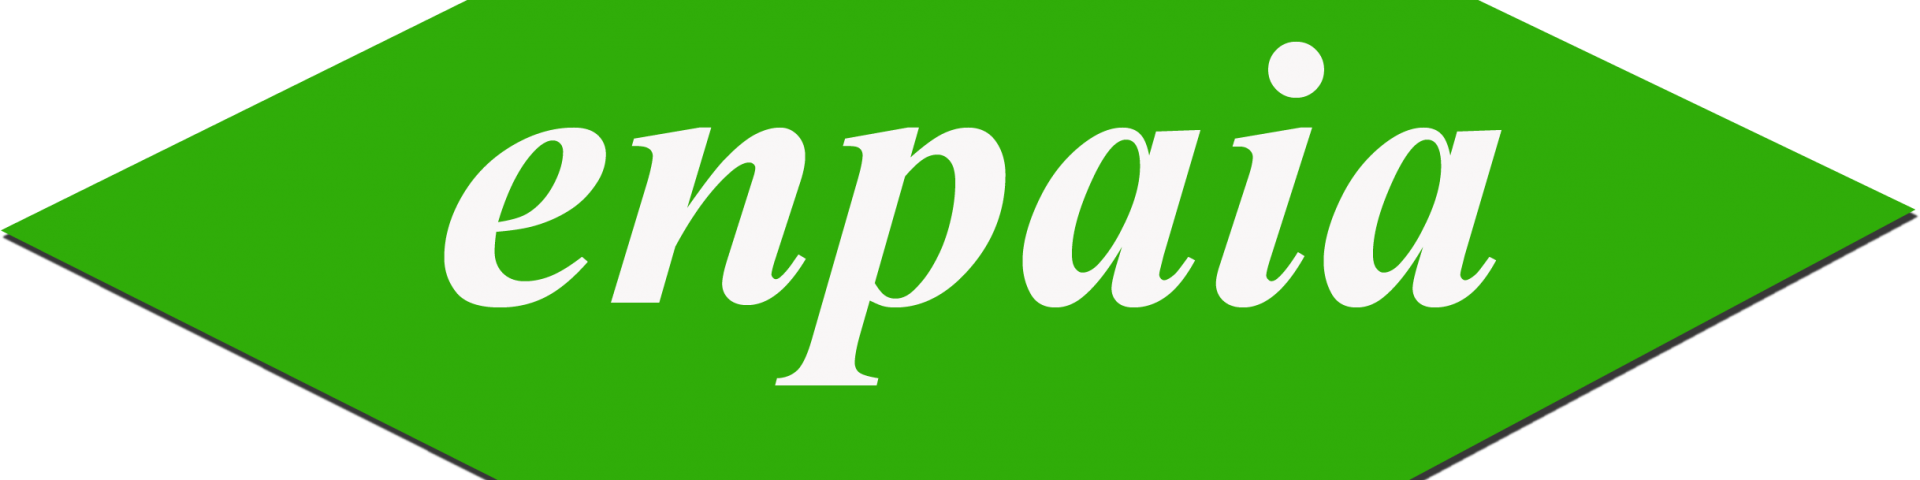 enpaia_logo